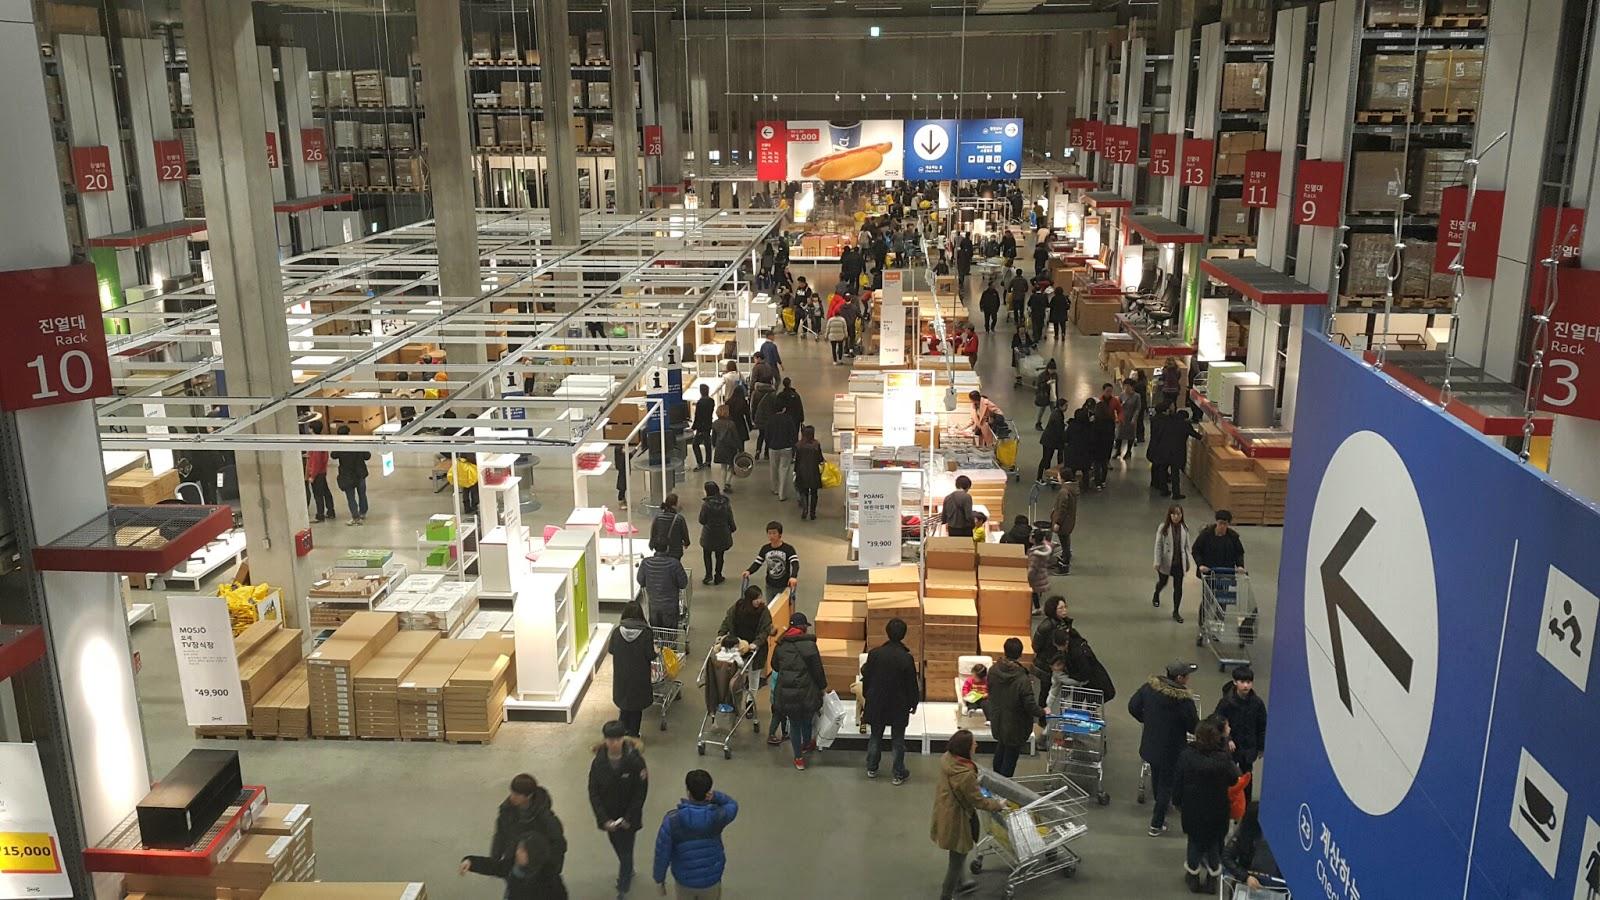 2nd biggest IKEA